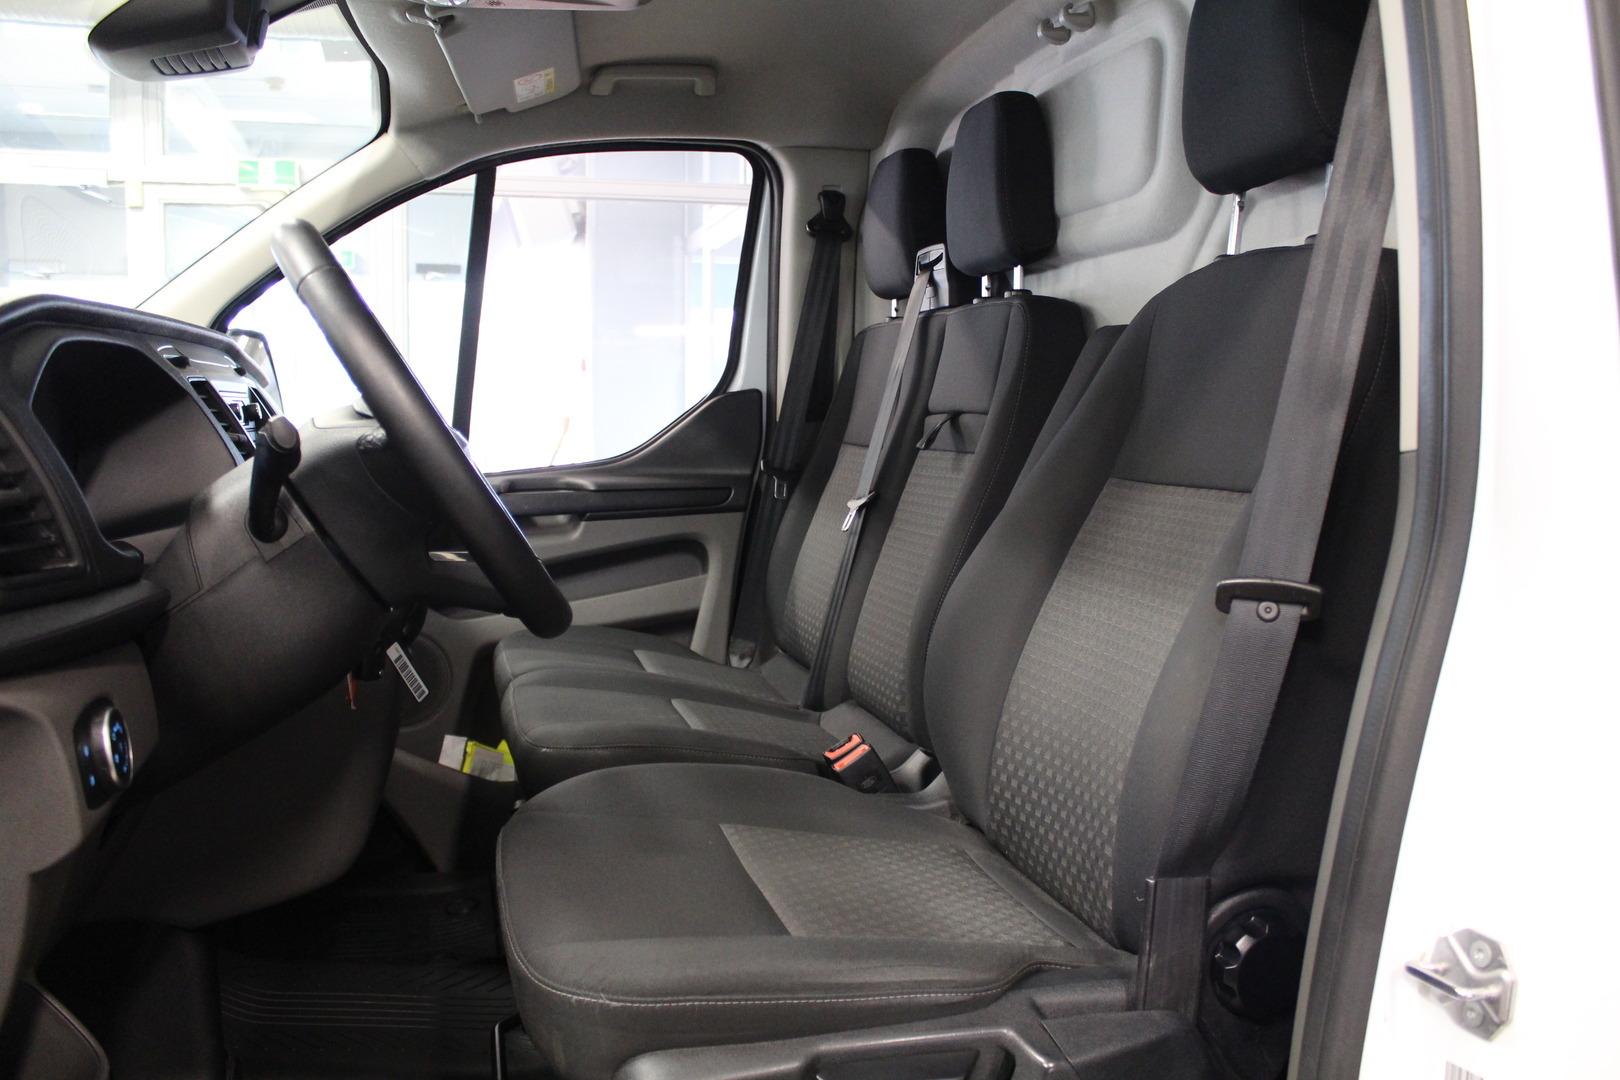 Ford Transit Custom, 310 2,0TDCi 130 hv Business L2H1 **Juuri tullut** #Takuu #Alvillinen #Tutkat